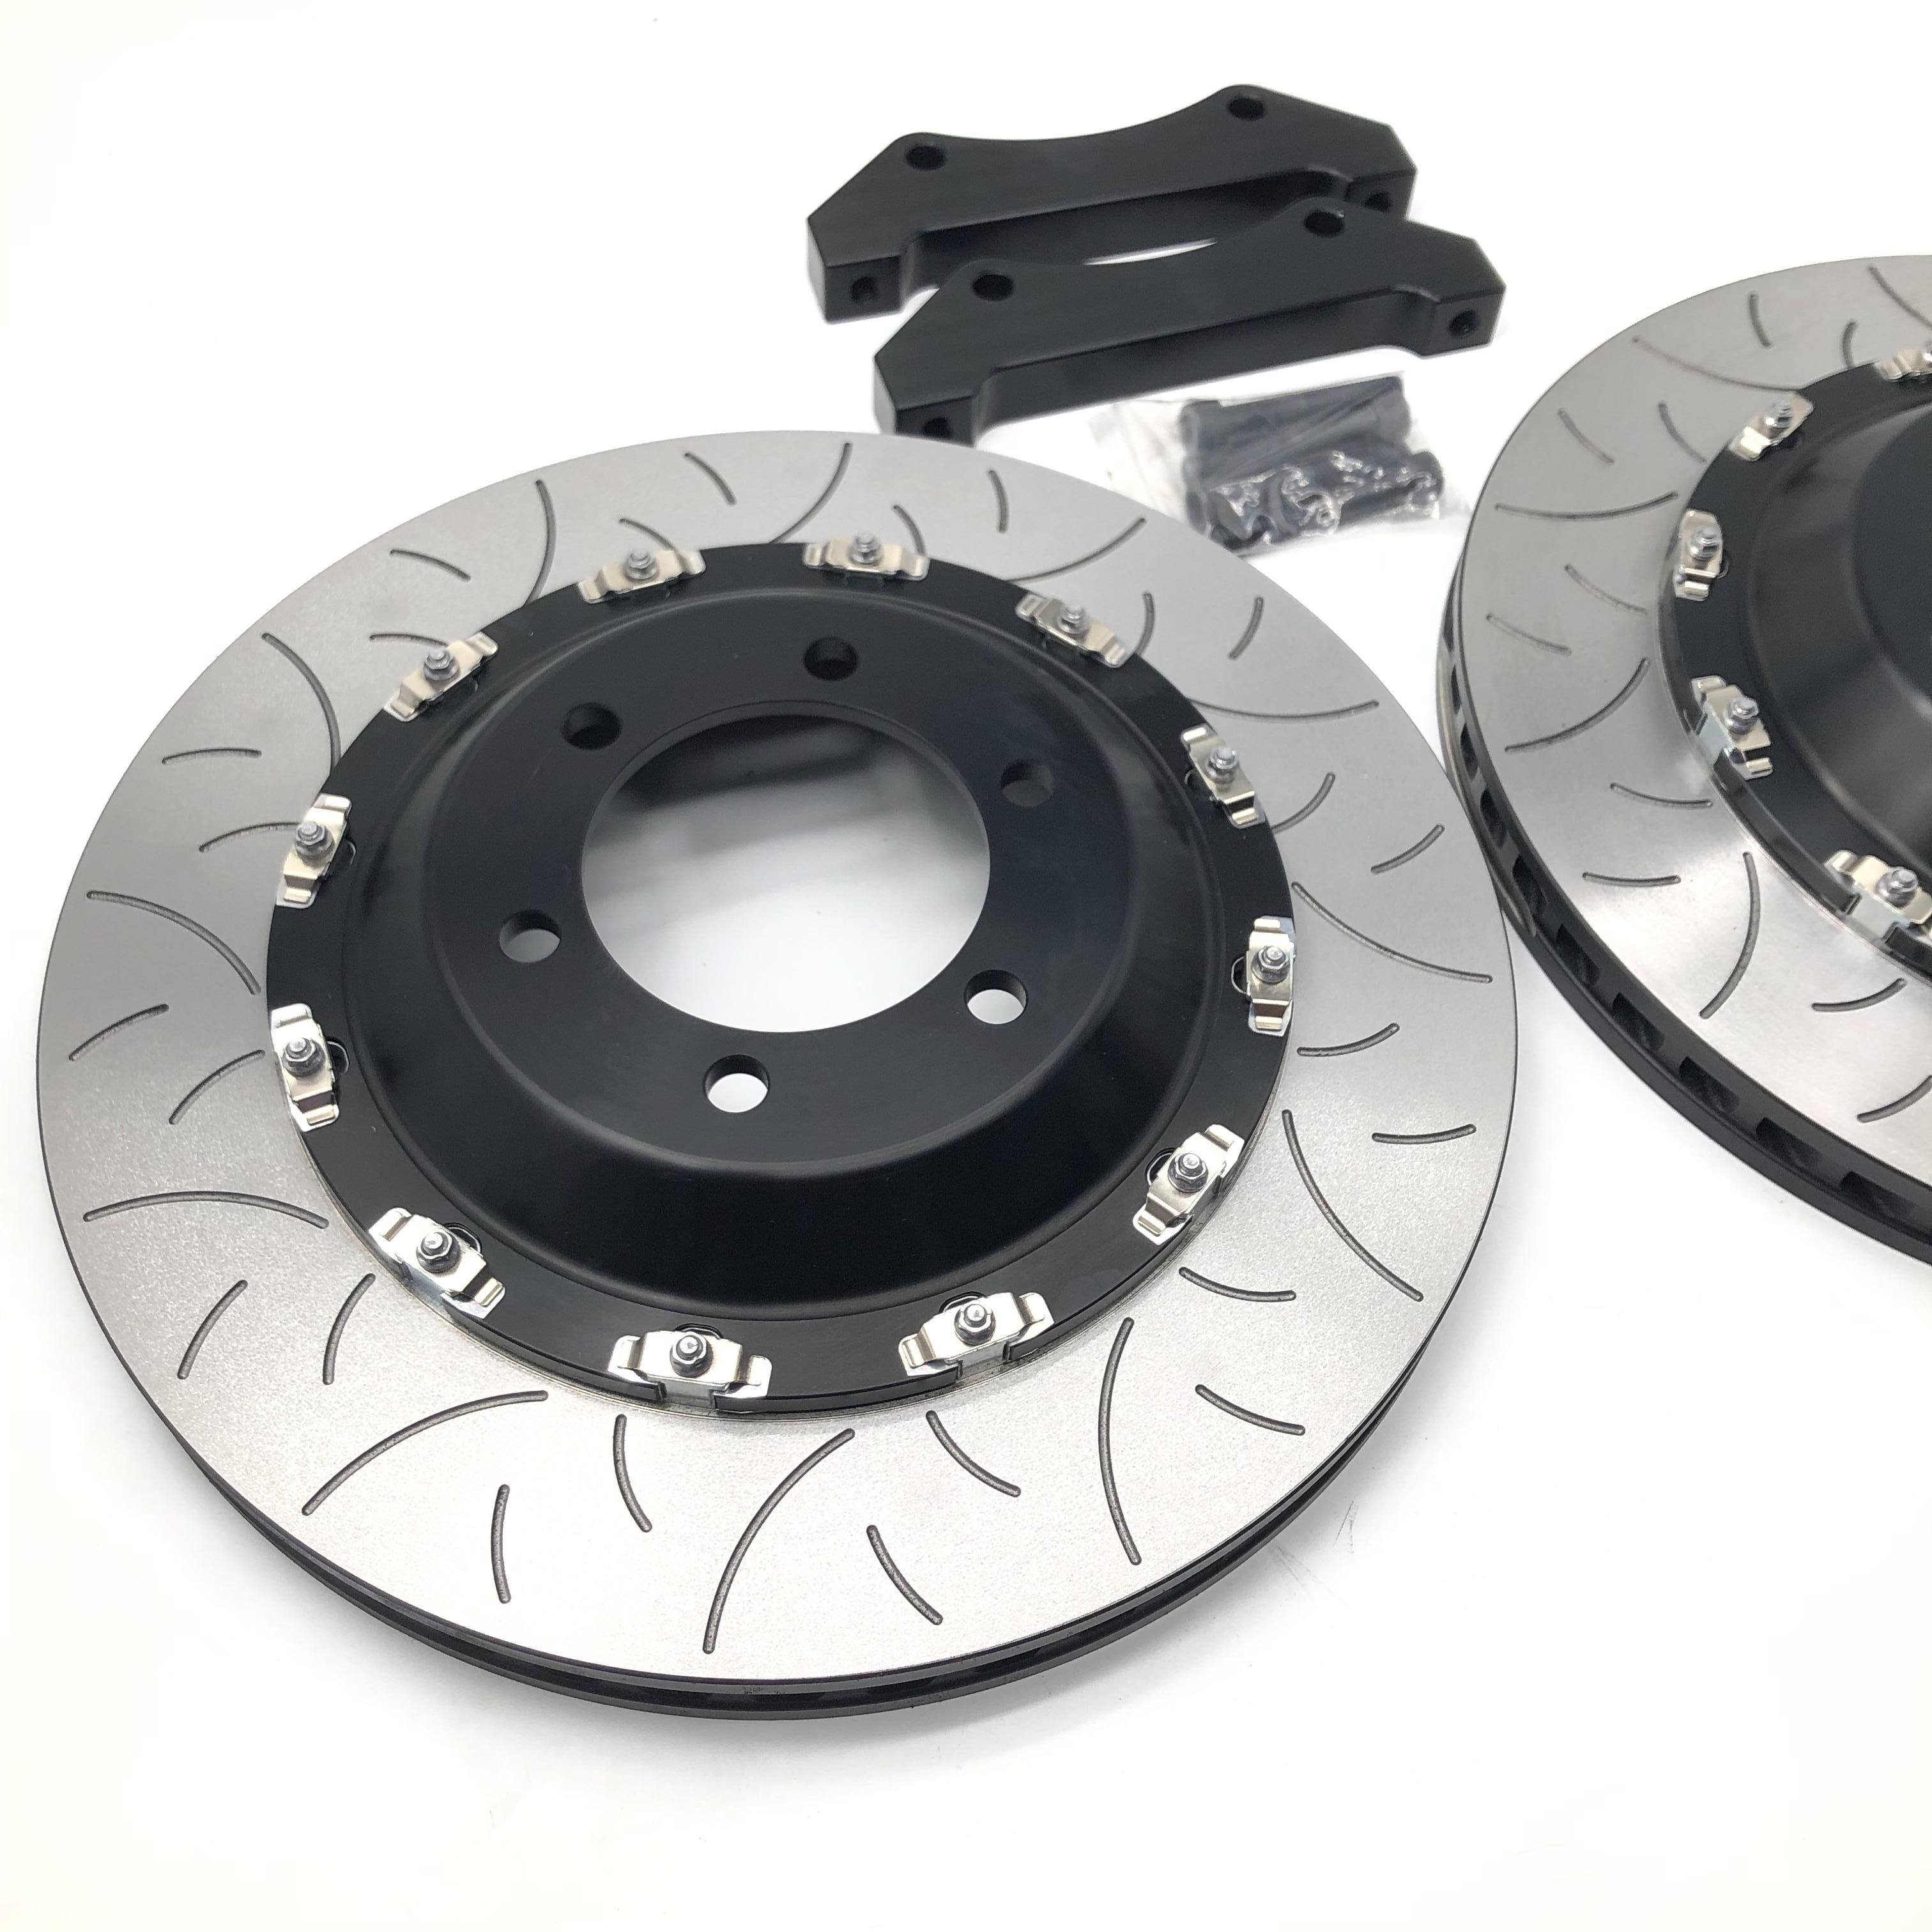 Six Piston Caliper Jekit RACING Car GTS6 Big Floating Brake KIT System FIT For Alfa/Ford-Lexus 18/19/20 rims